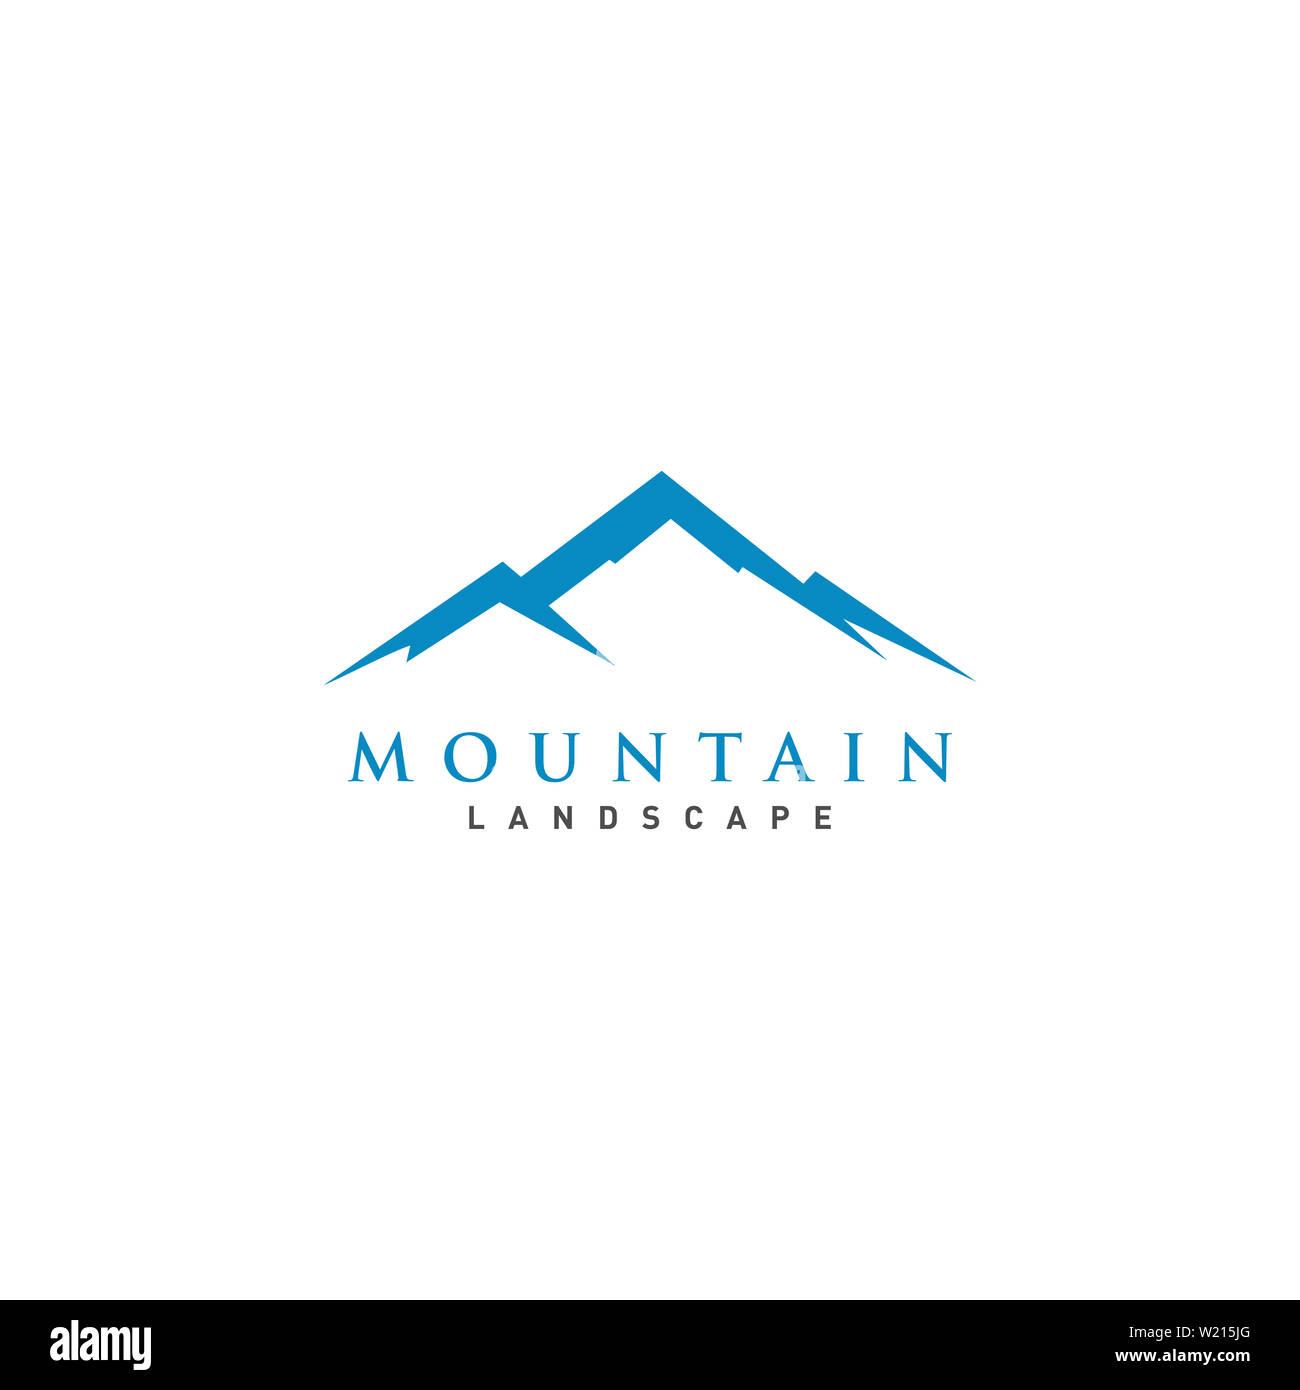 Mountain or hill or Peak logo design vector - Stock Image